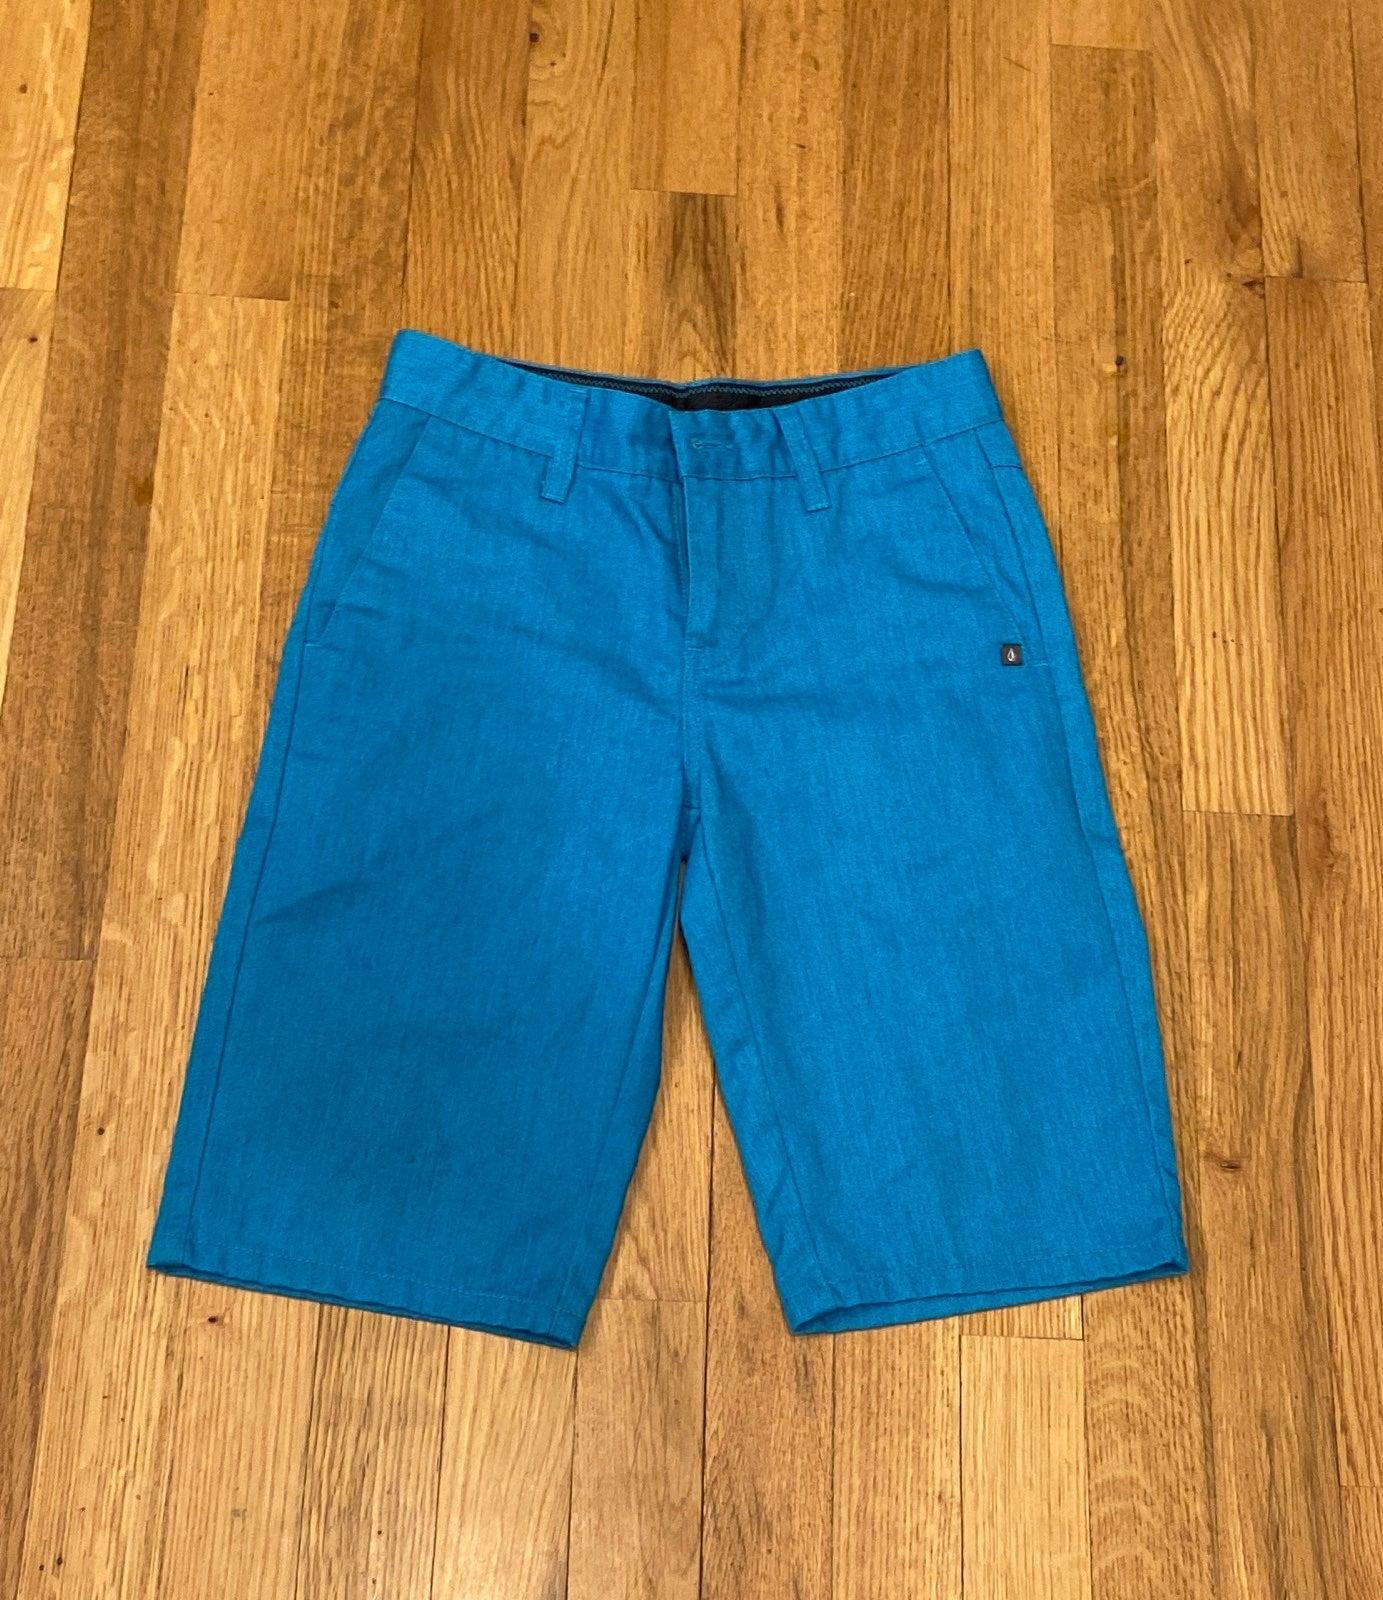 Volcom shorts 10